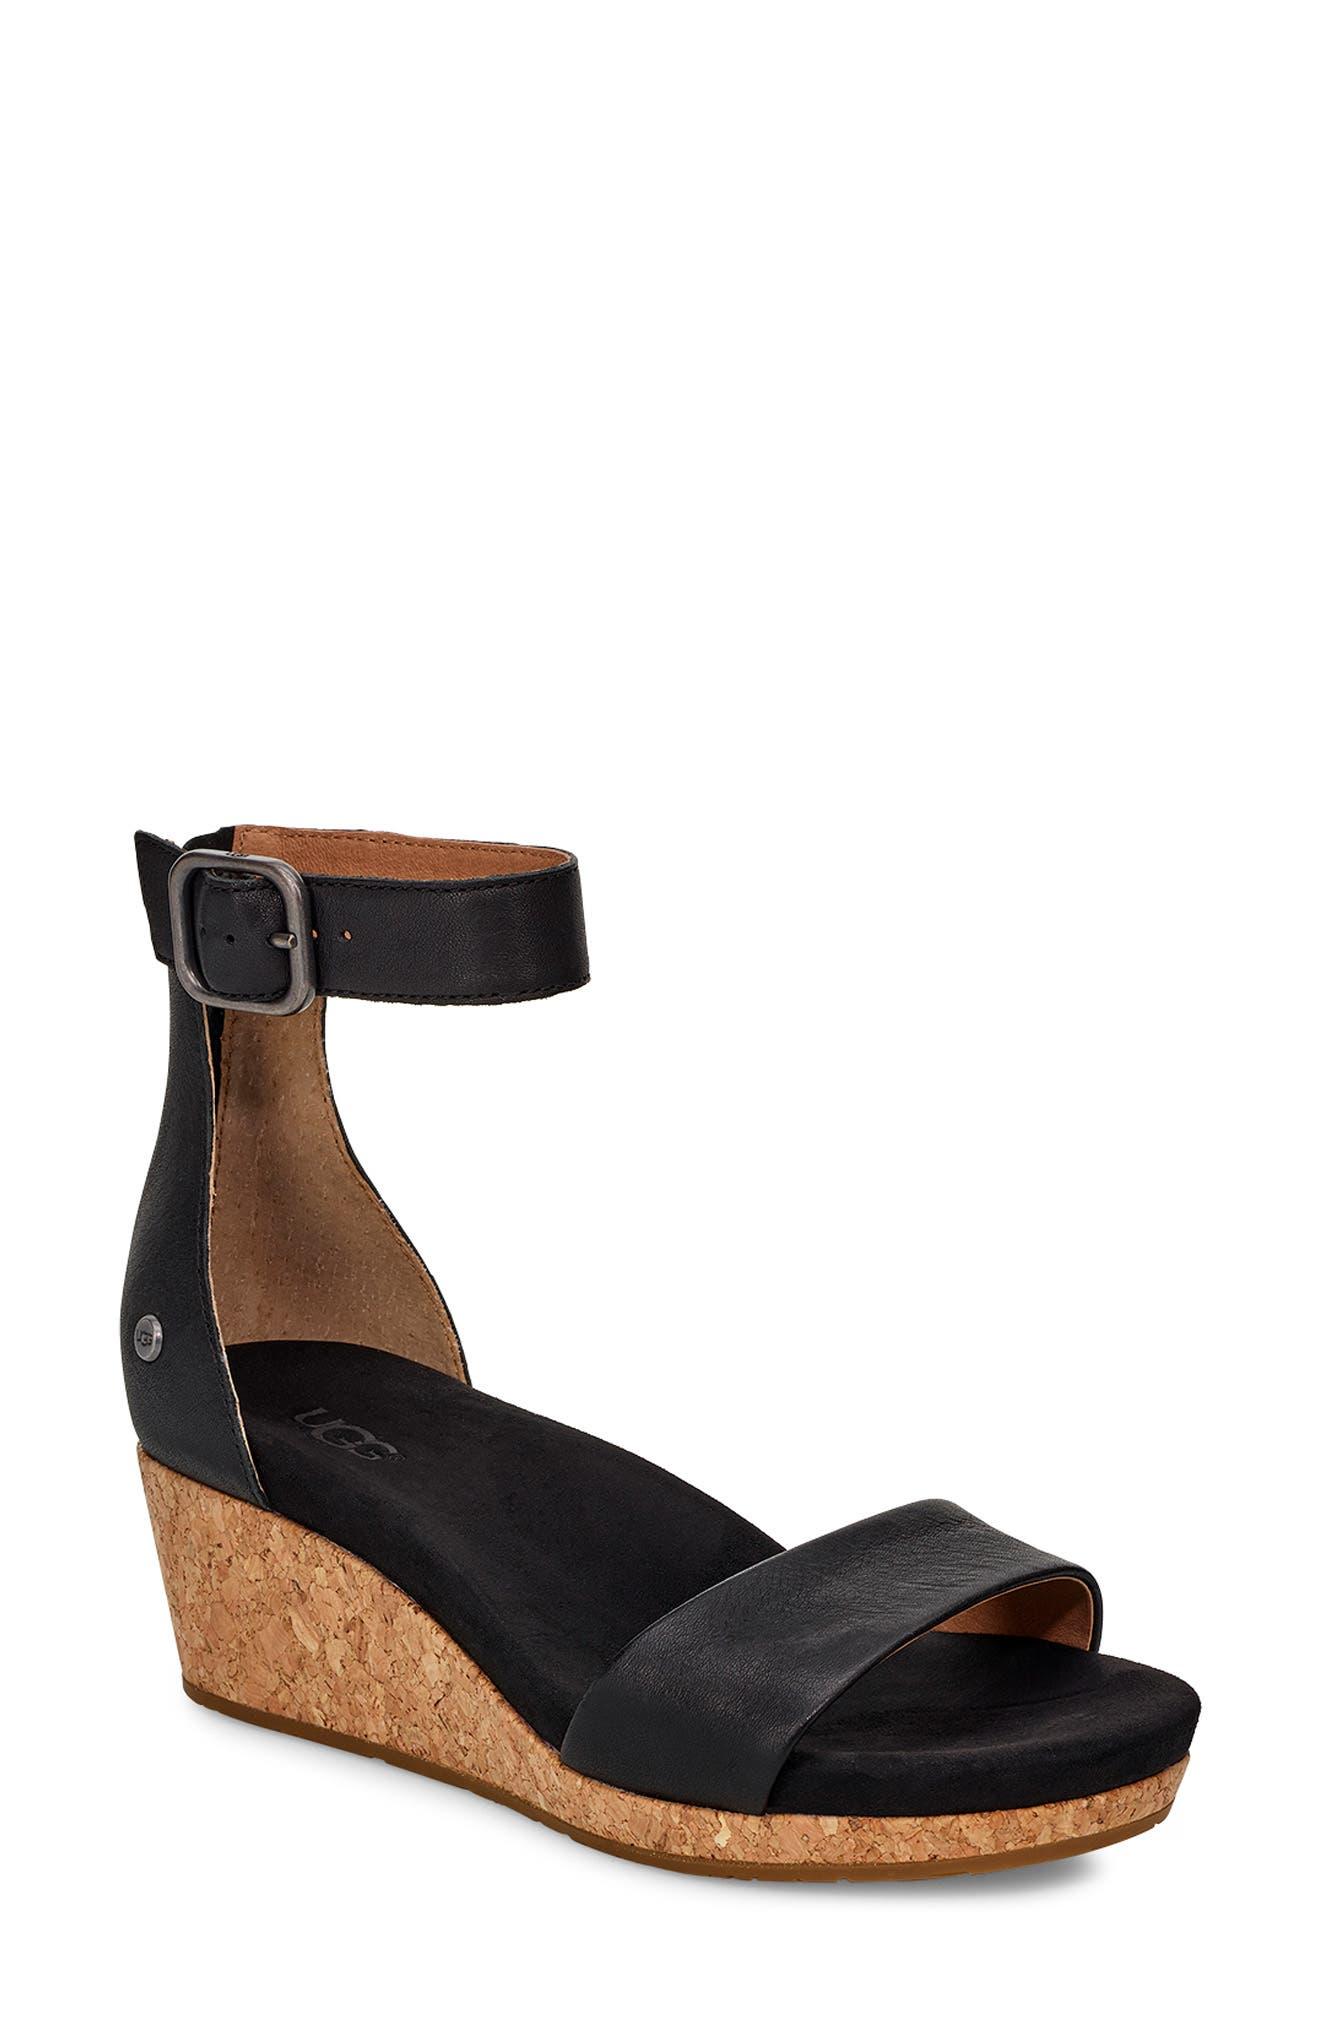 UGG<SUP>®</SUP> Zoe II Wedge Sandal, Main, color, BLACK LEATHER